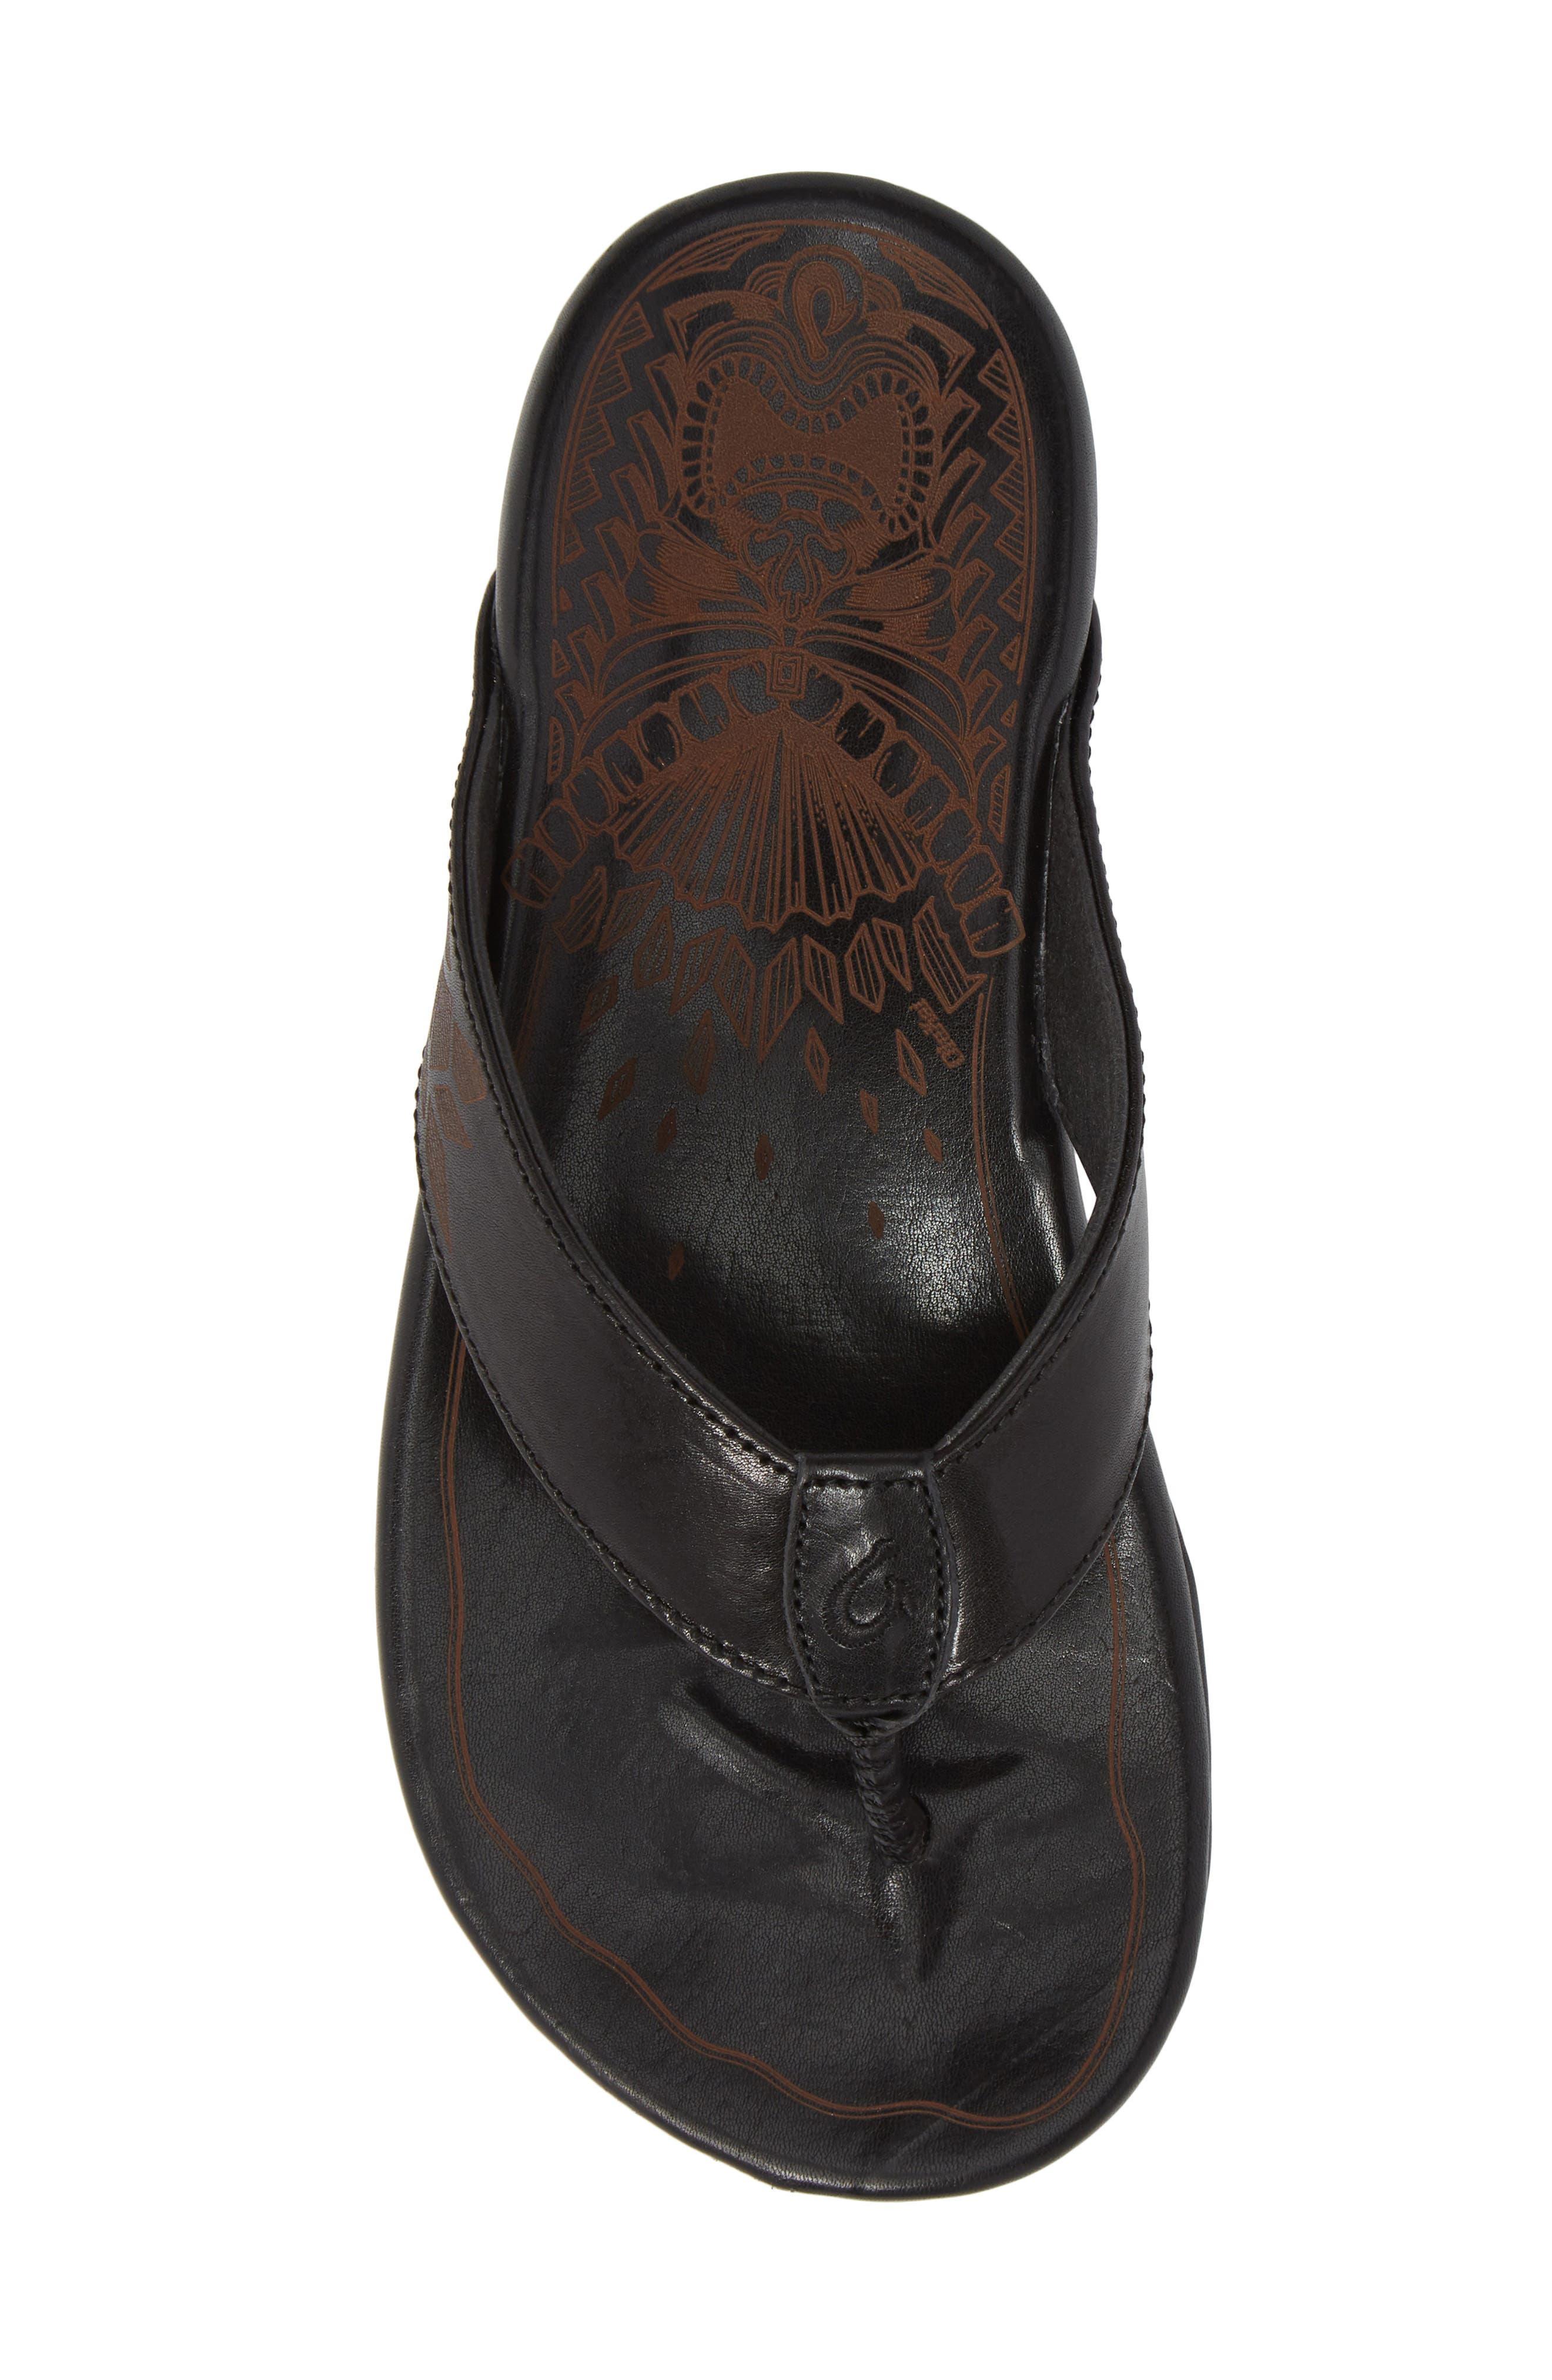 Kulia Flip Flop,                             Alternate thumbnail 5, color,                             Black/ Black Leather